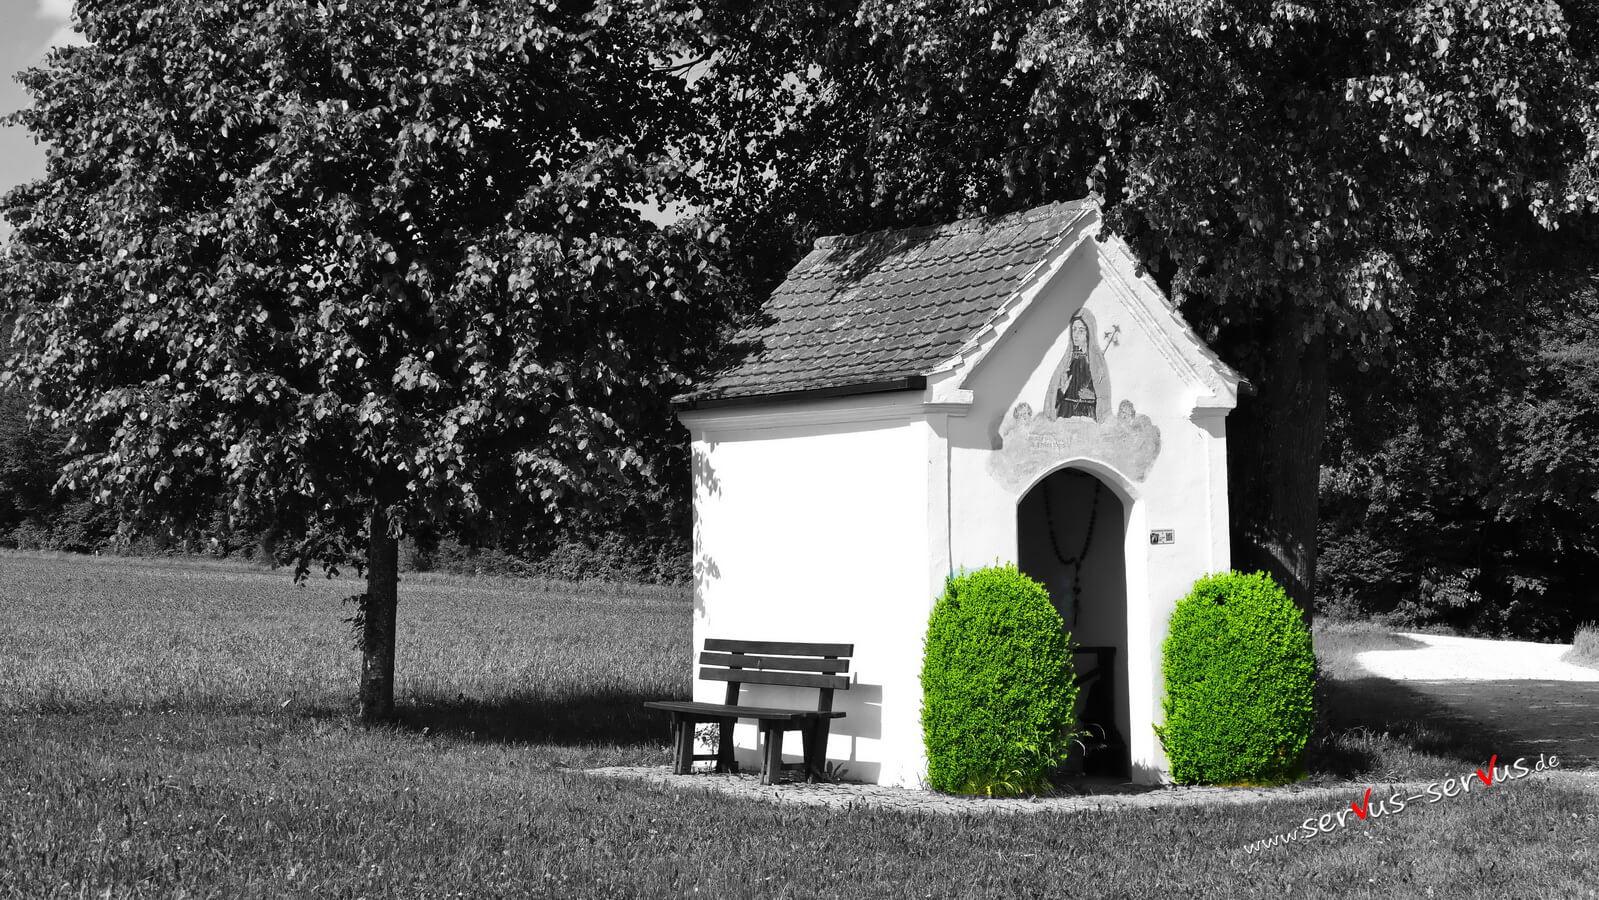 Kapelle mit grünem Busch, Colorkey